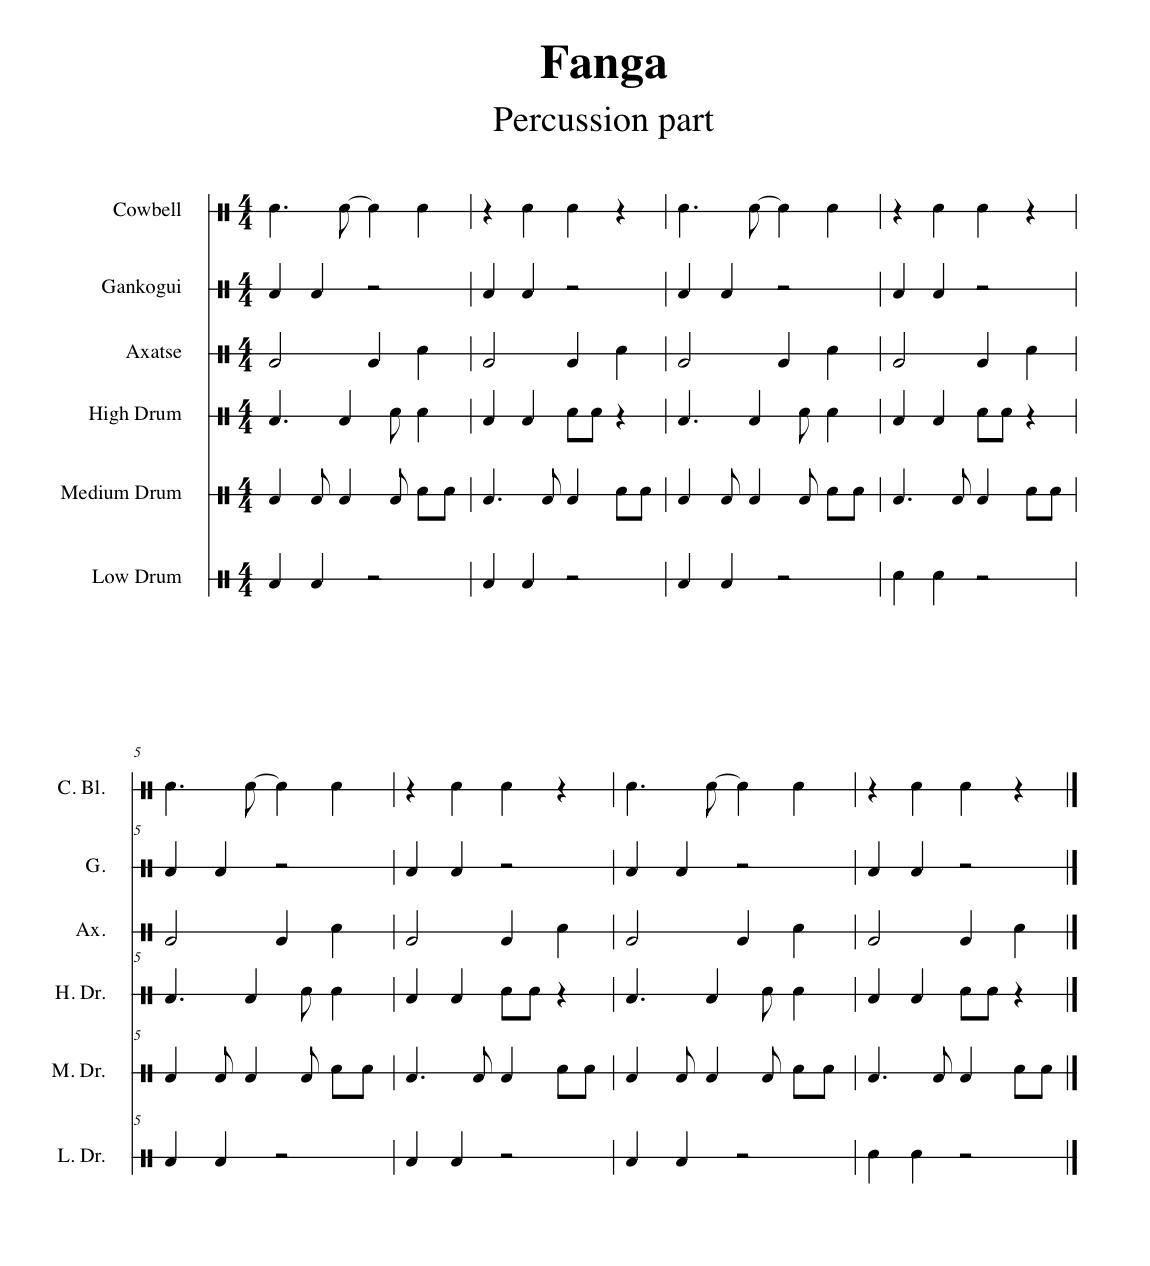 Bollywood Sheet Music September 2011: Church Drummers